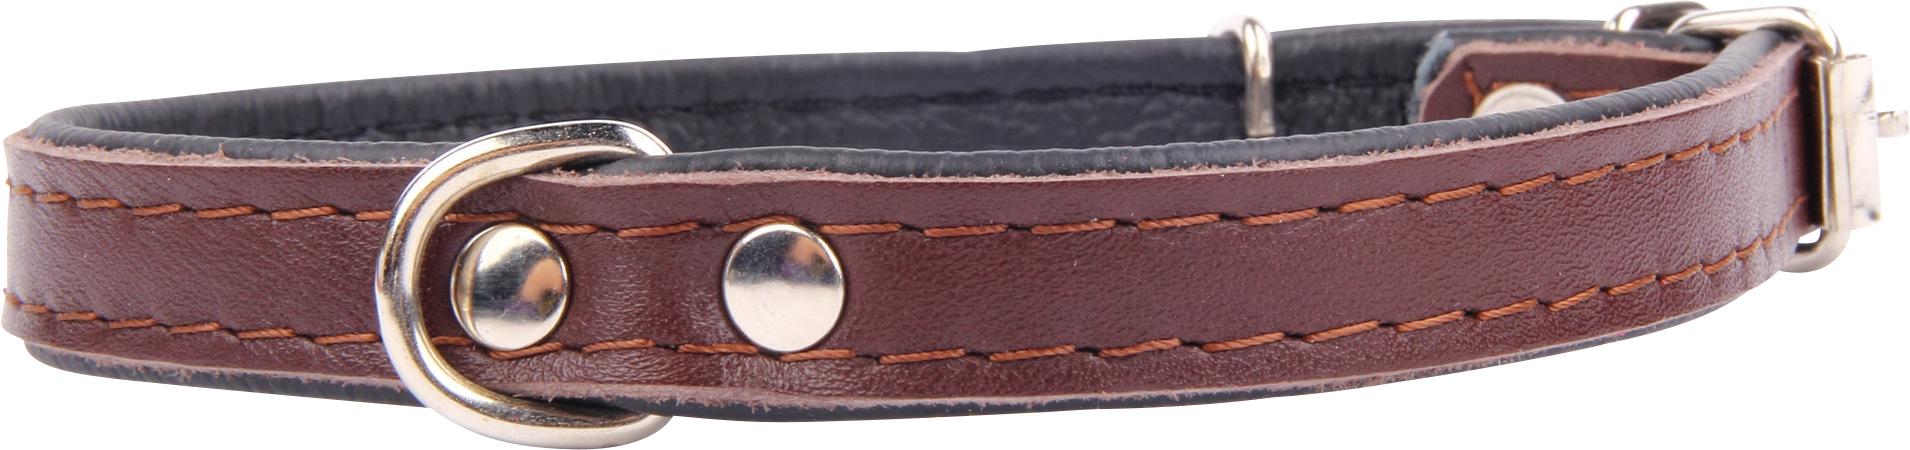 Läderhalsband, brun 45 cm